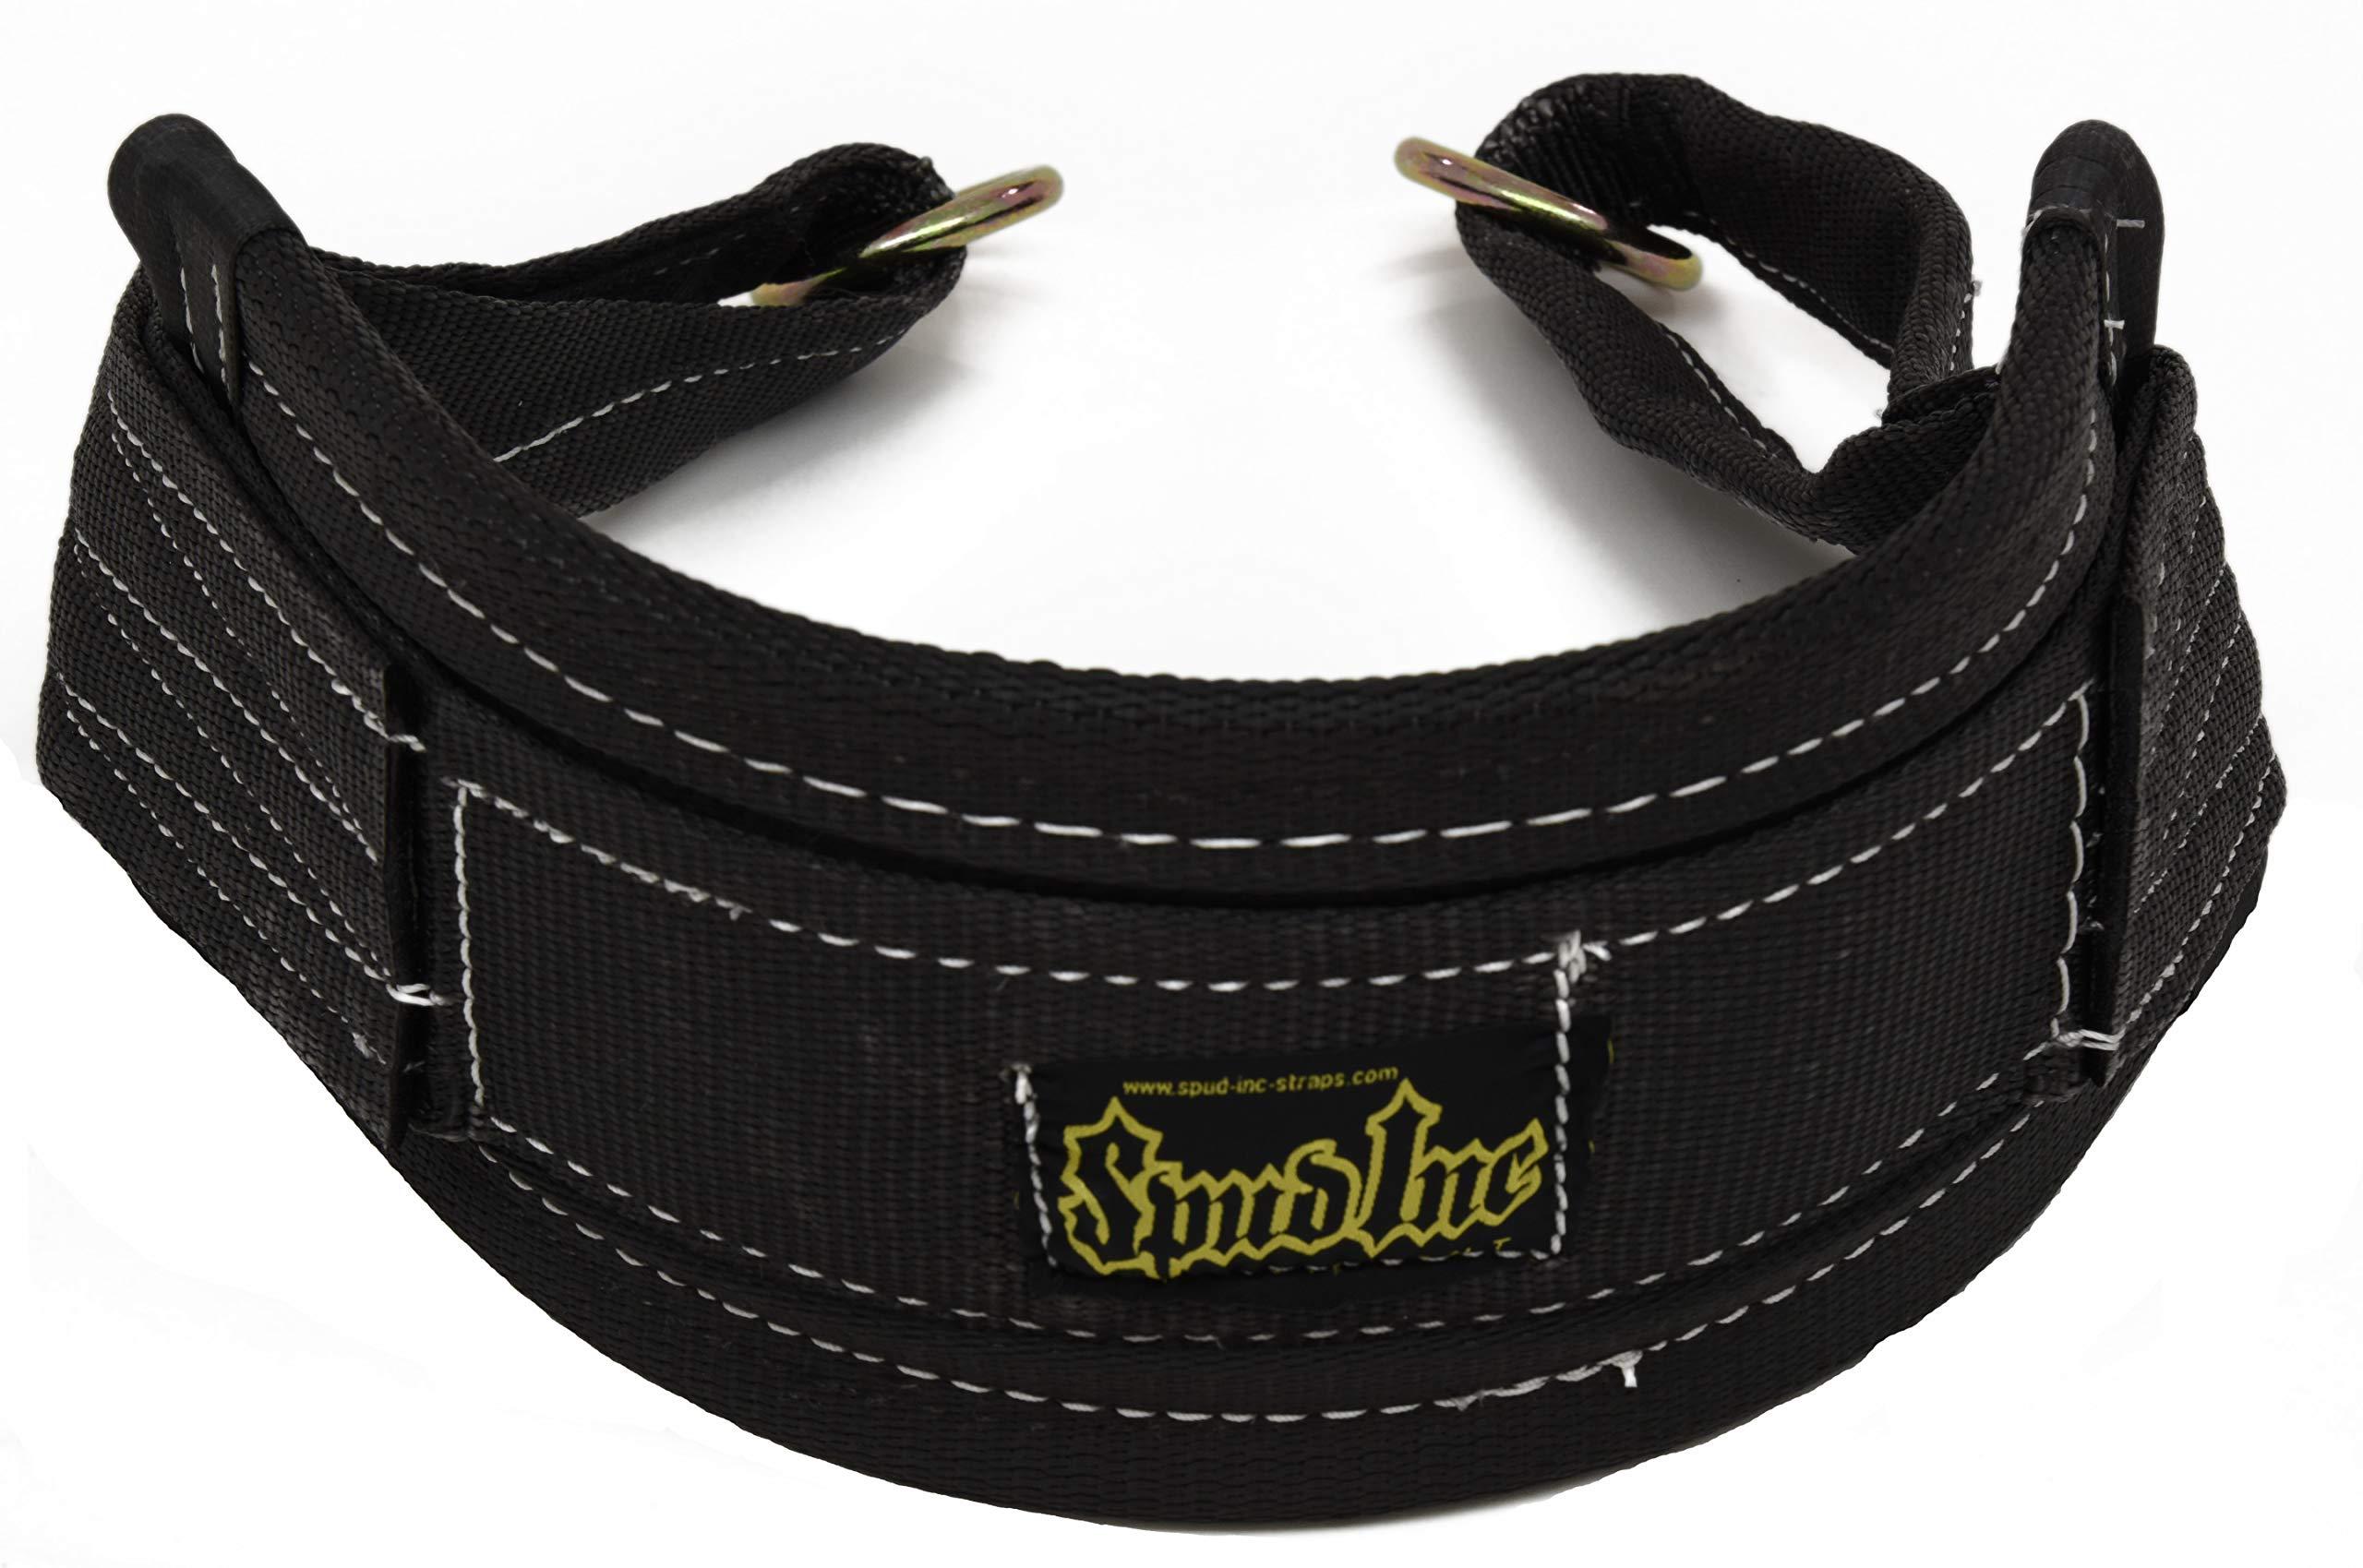 Spud Belt Squat Medium Belt for Weight Lifting Strength Training and Power Lifting (Black)